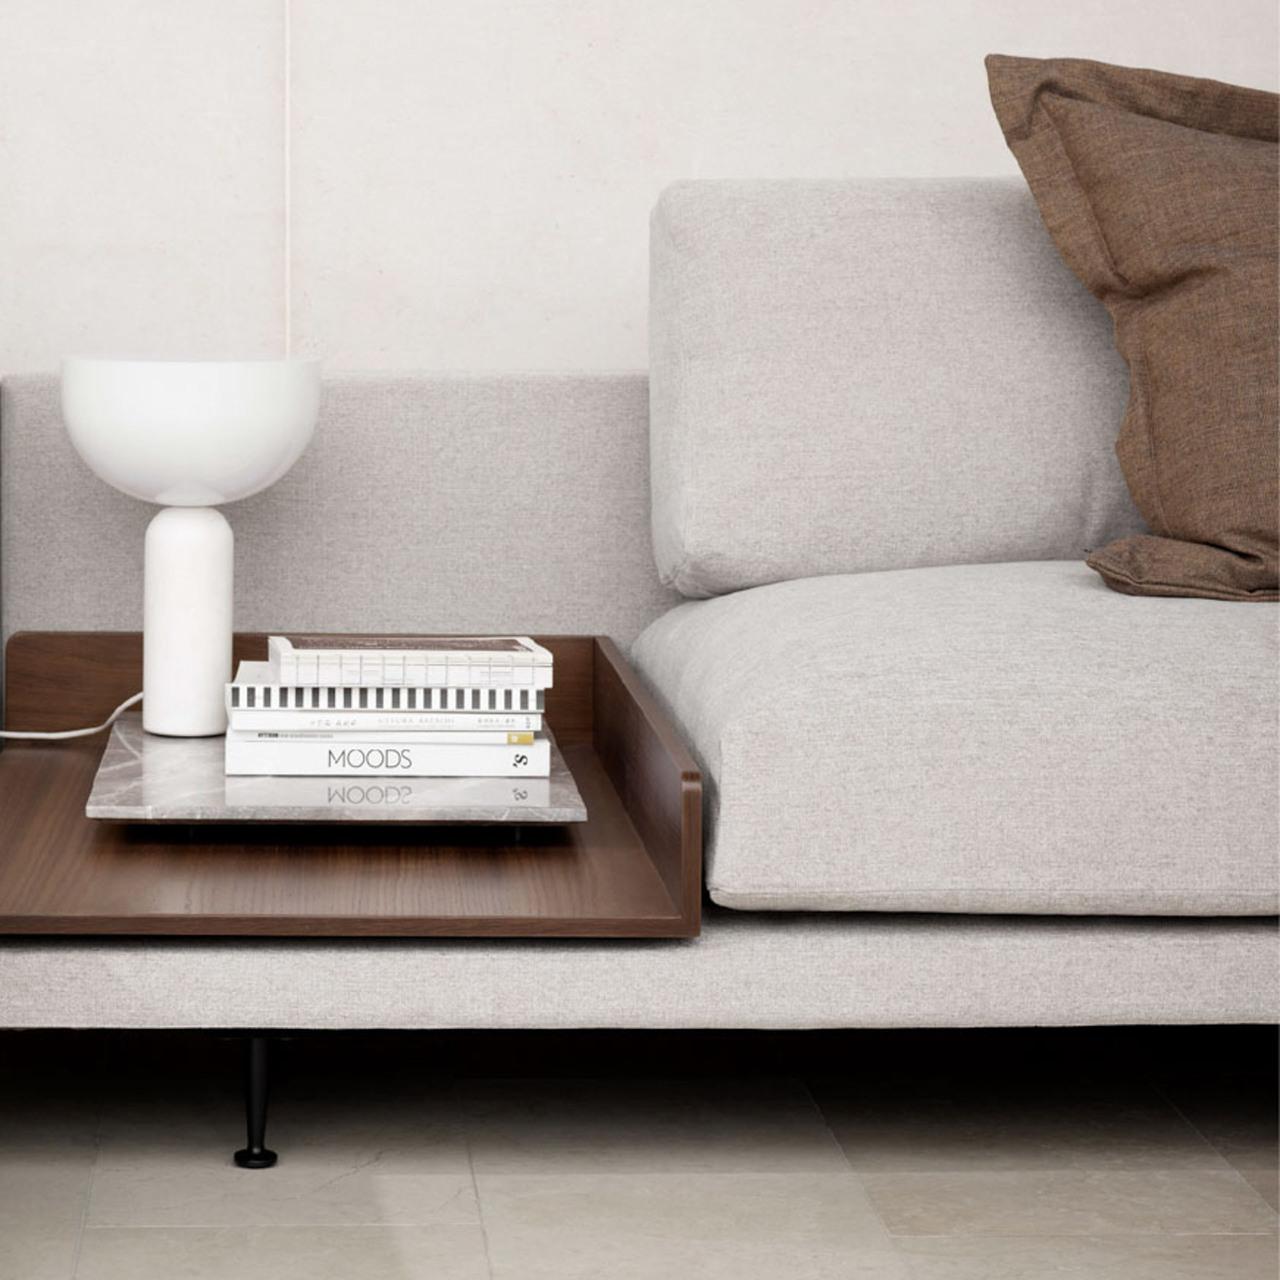 Sofa Maho mit chaise longue Wendelbo